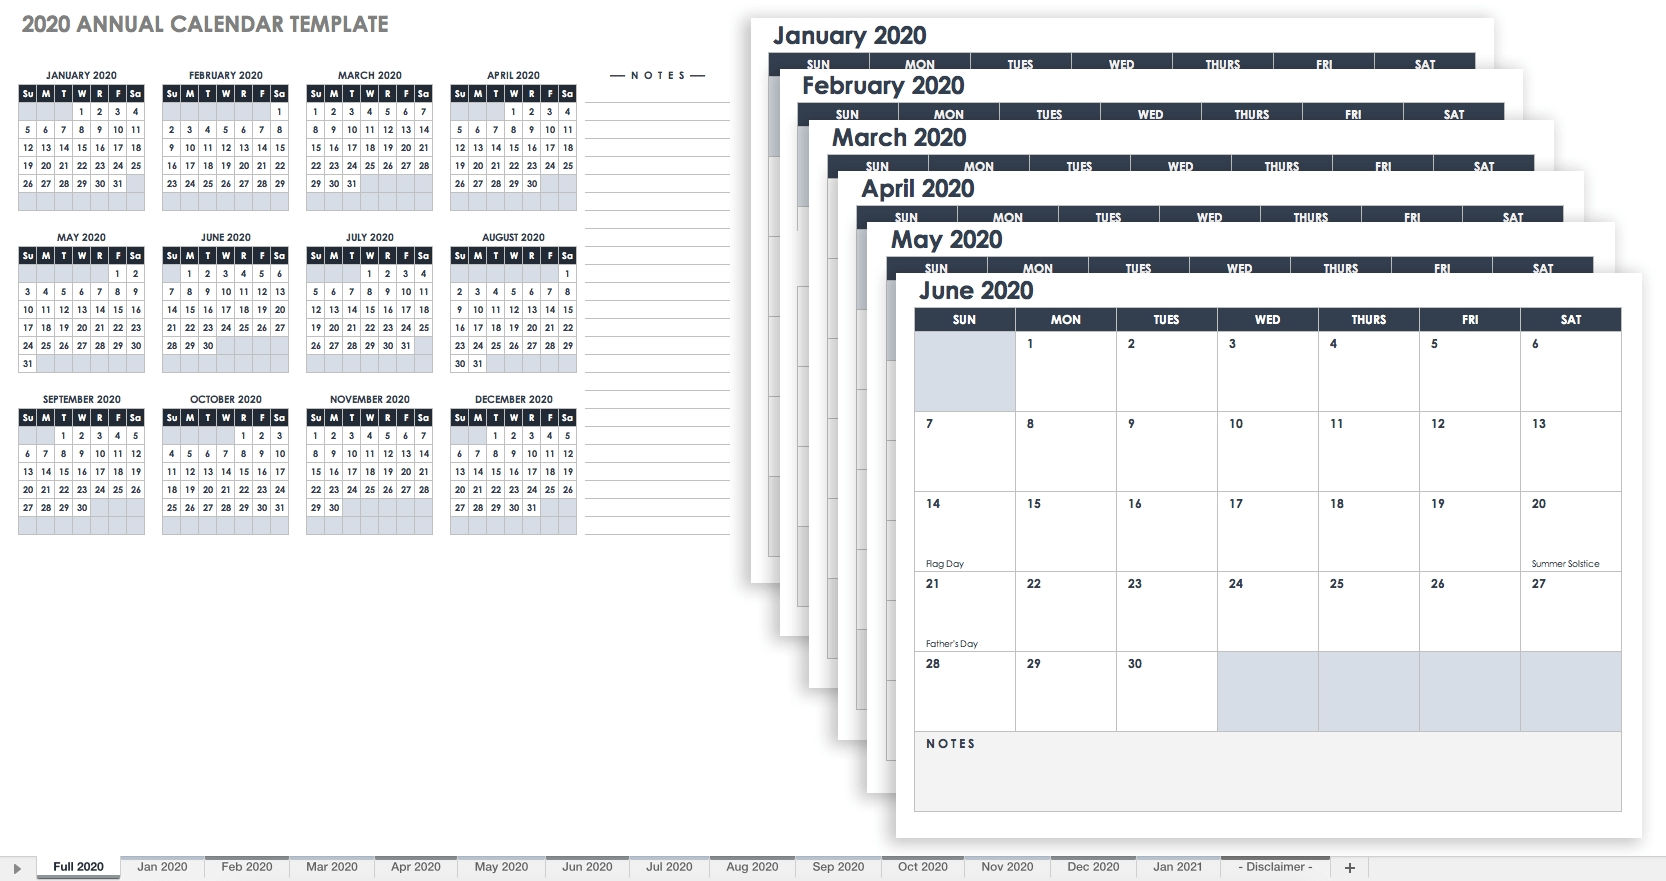 Free, Printable Excel Calendar Templates For 2019 & On   Smartsheet inside Free Color Printable 2019 2020 Calendar